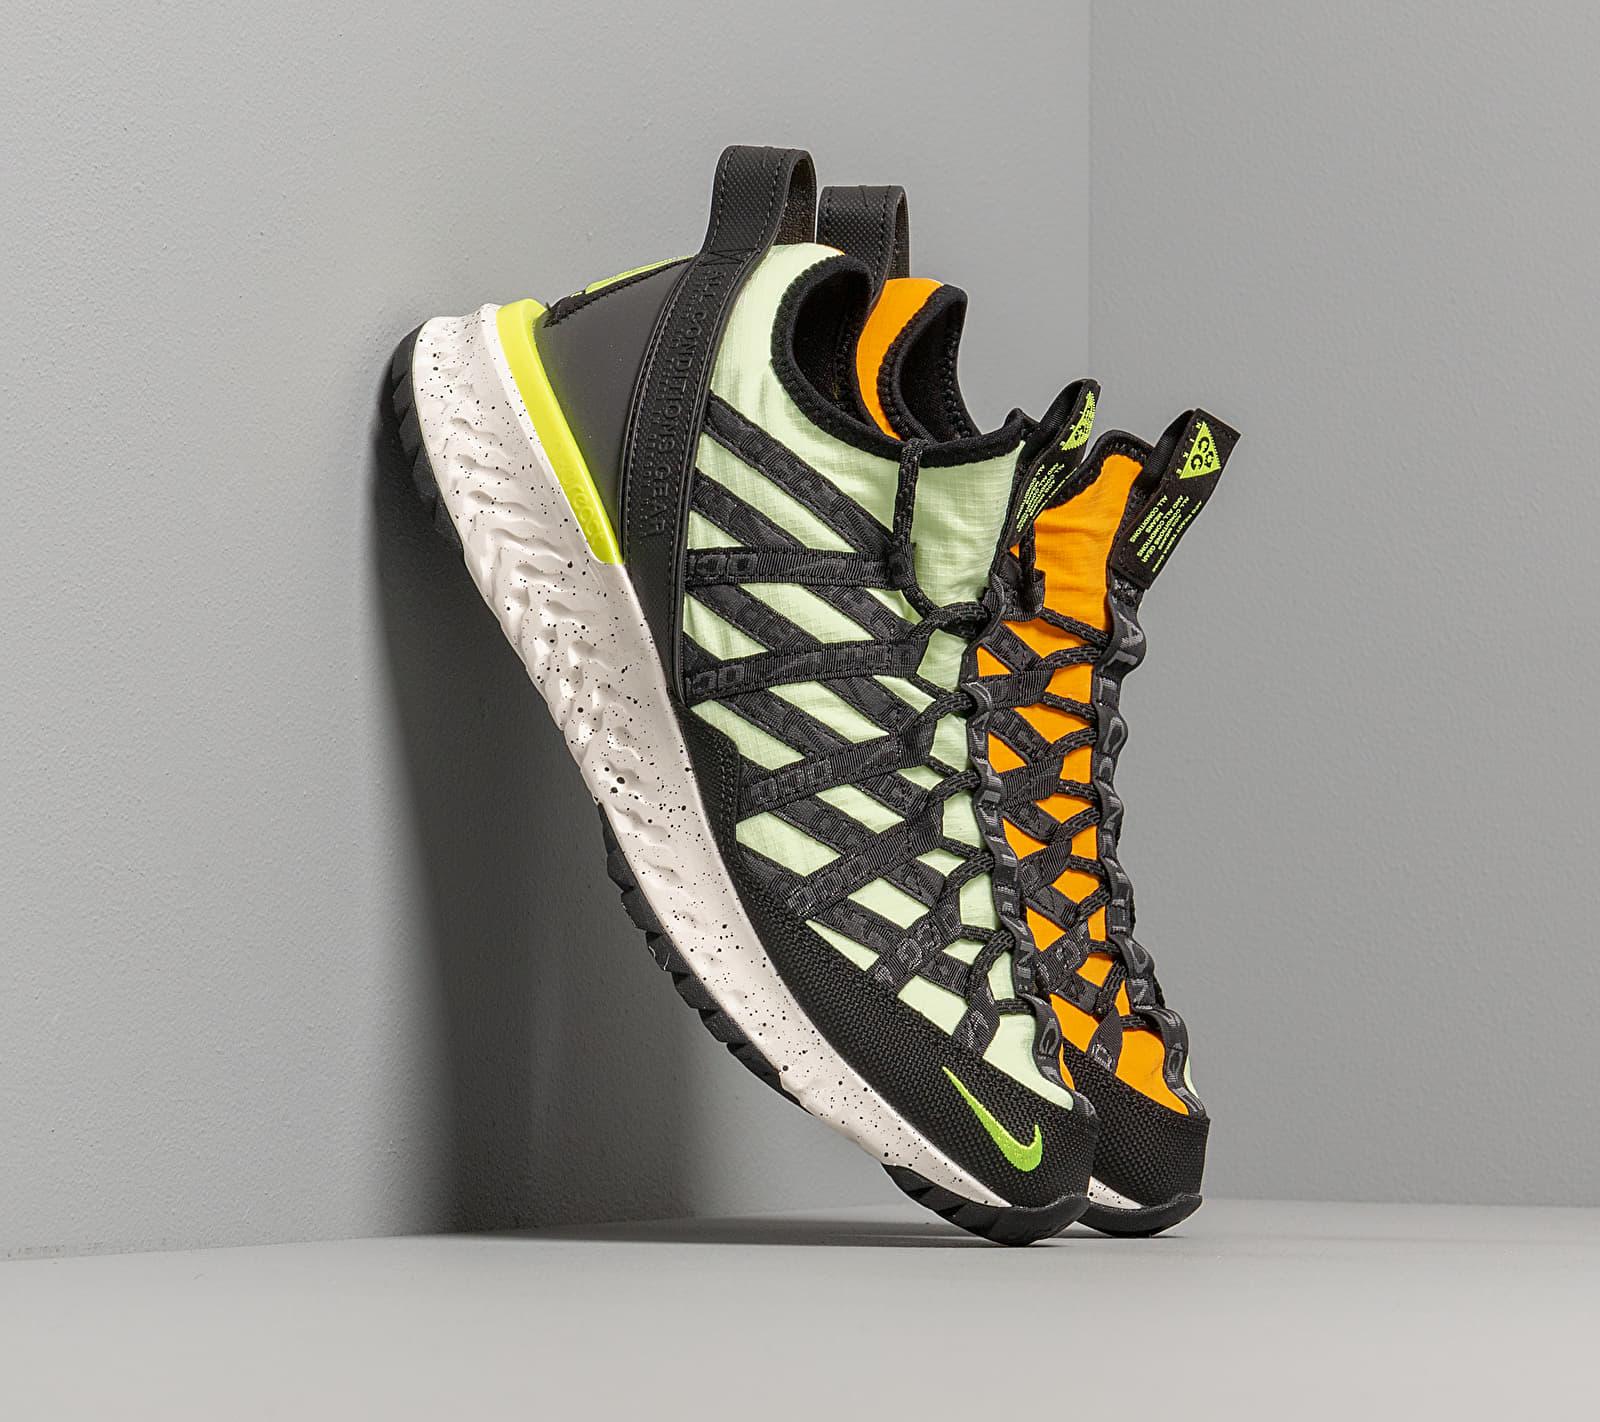 Nike ACG React Terra Gobe Barely Volt/ Volt-University Gold BV6344-701